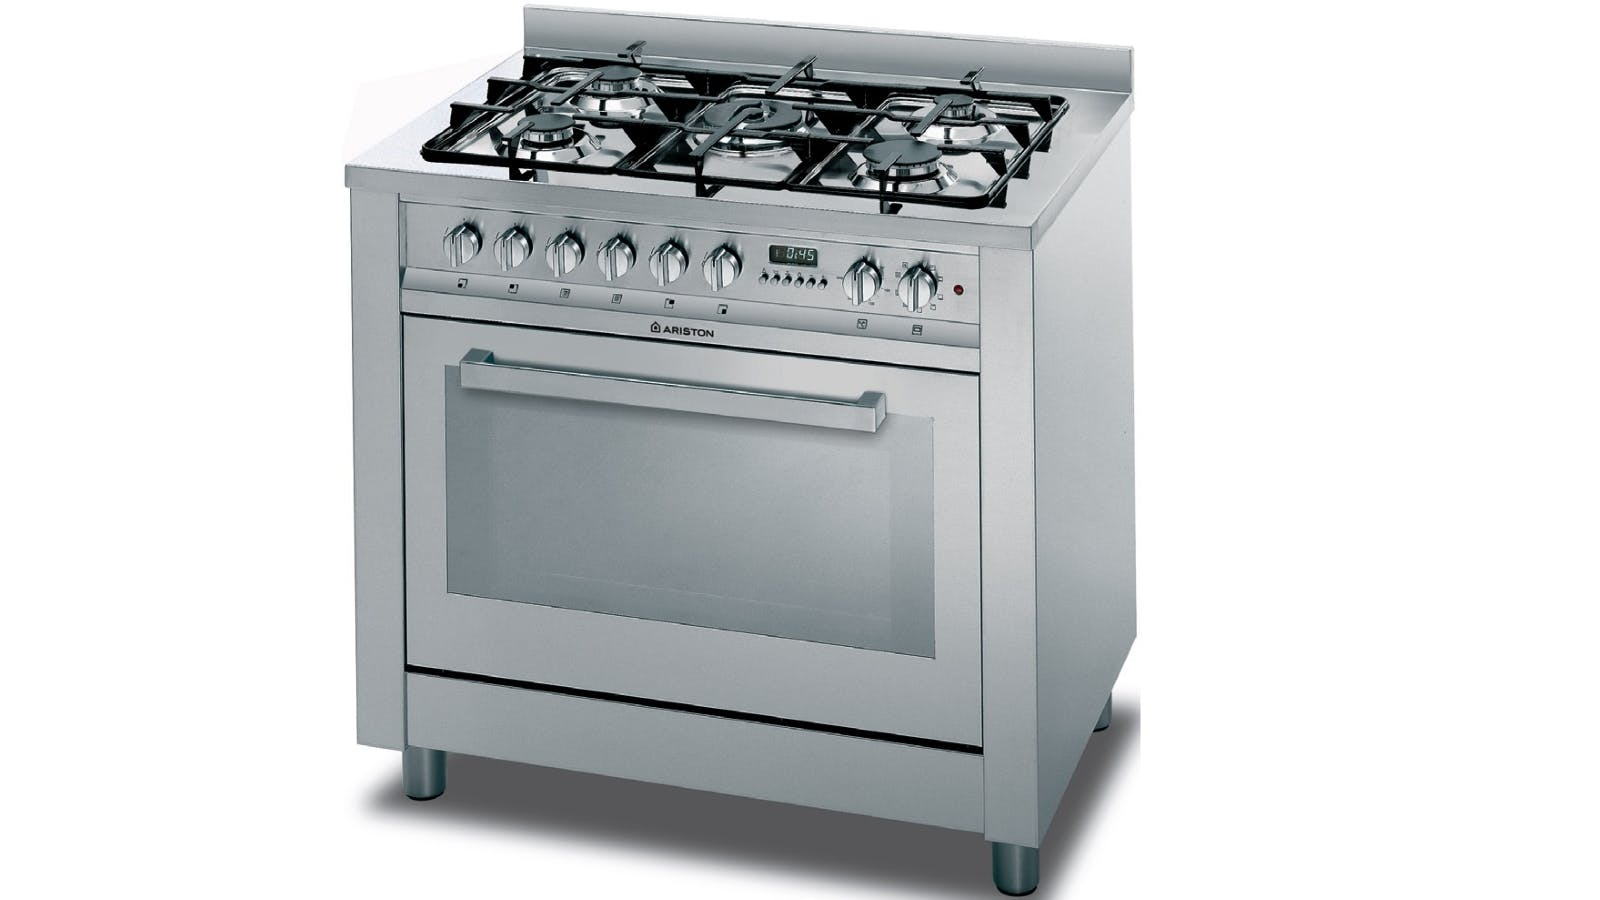 Ariston 90cm Professional Freestanding Cooker   Domayne